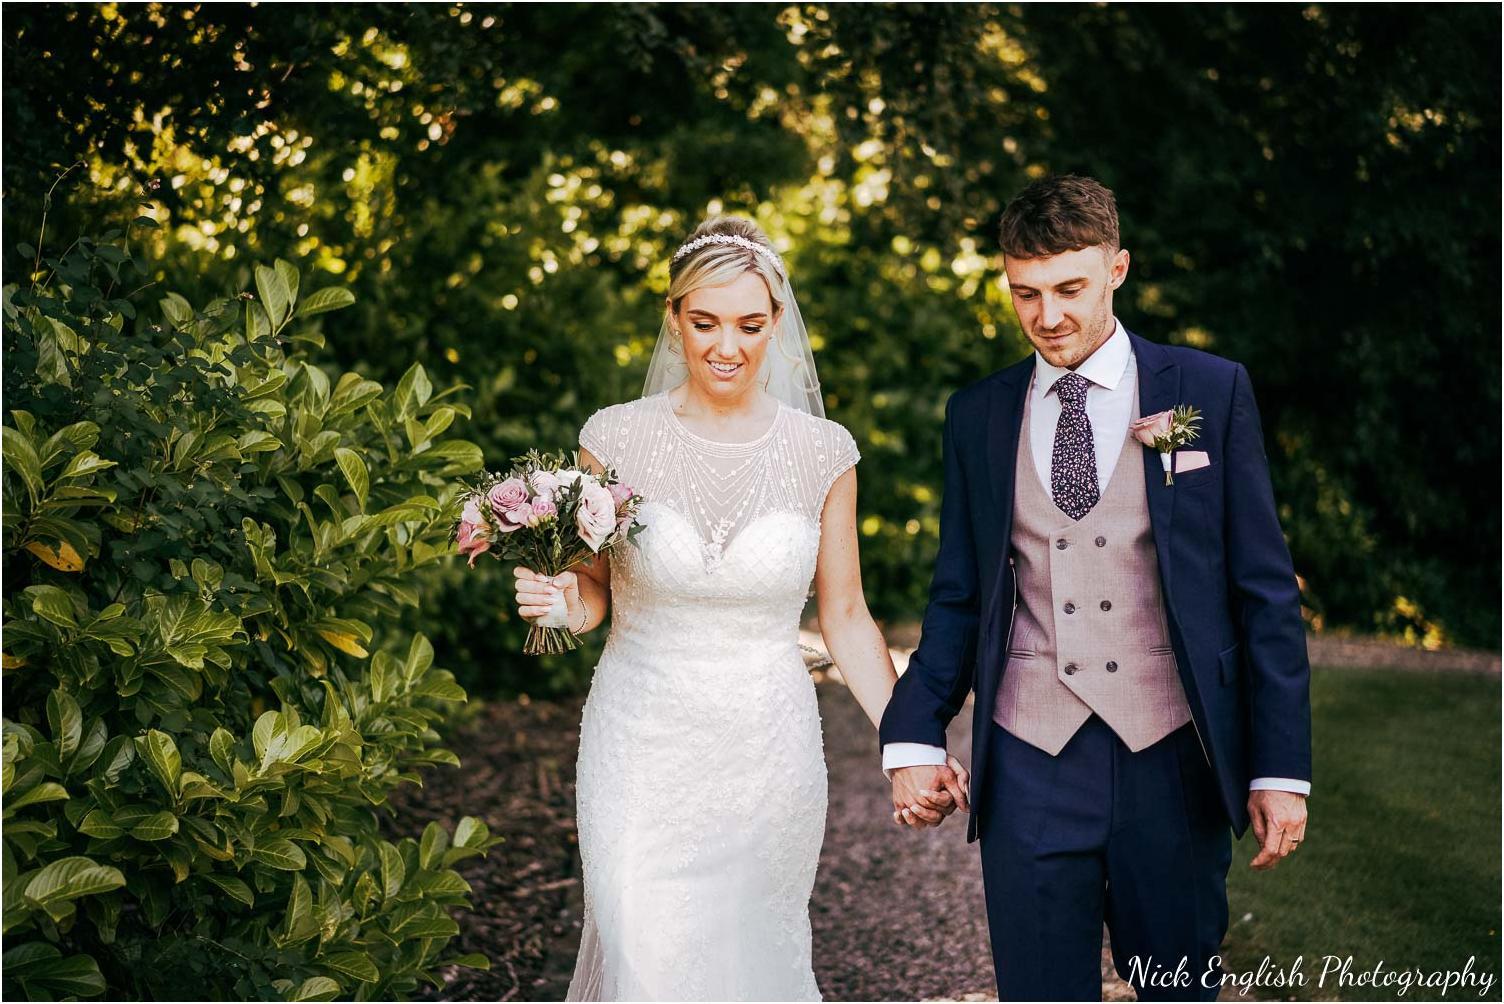 Mitton_Hall_Wedding_Photograph-102.jpg